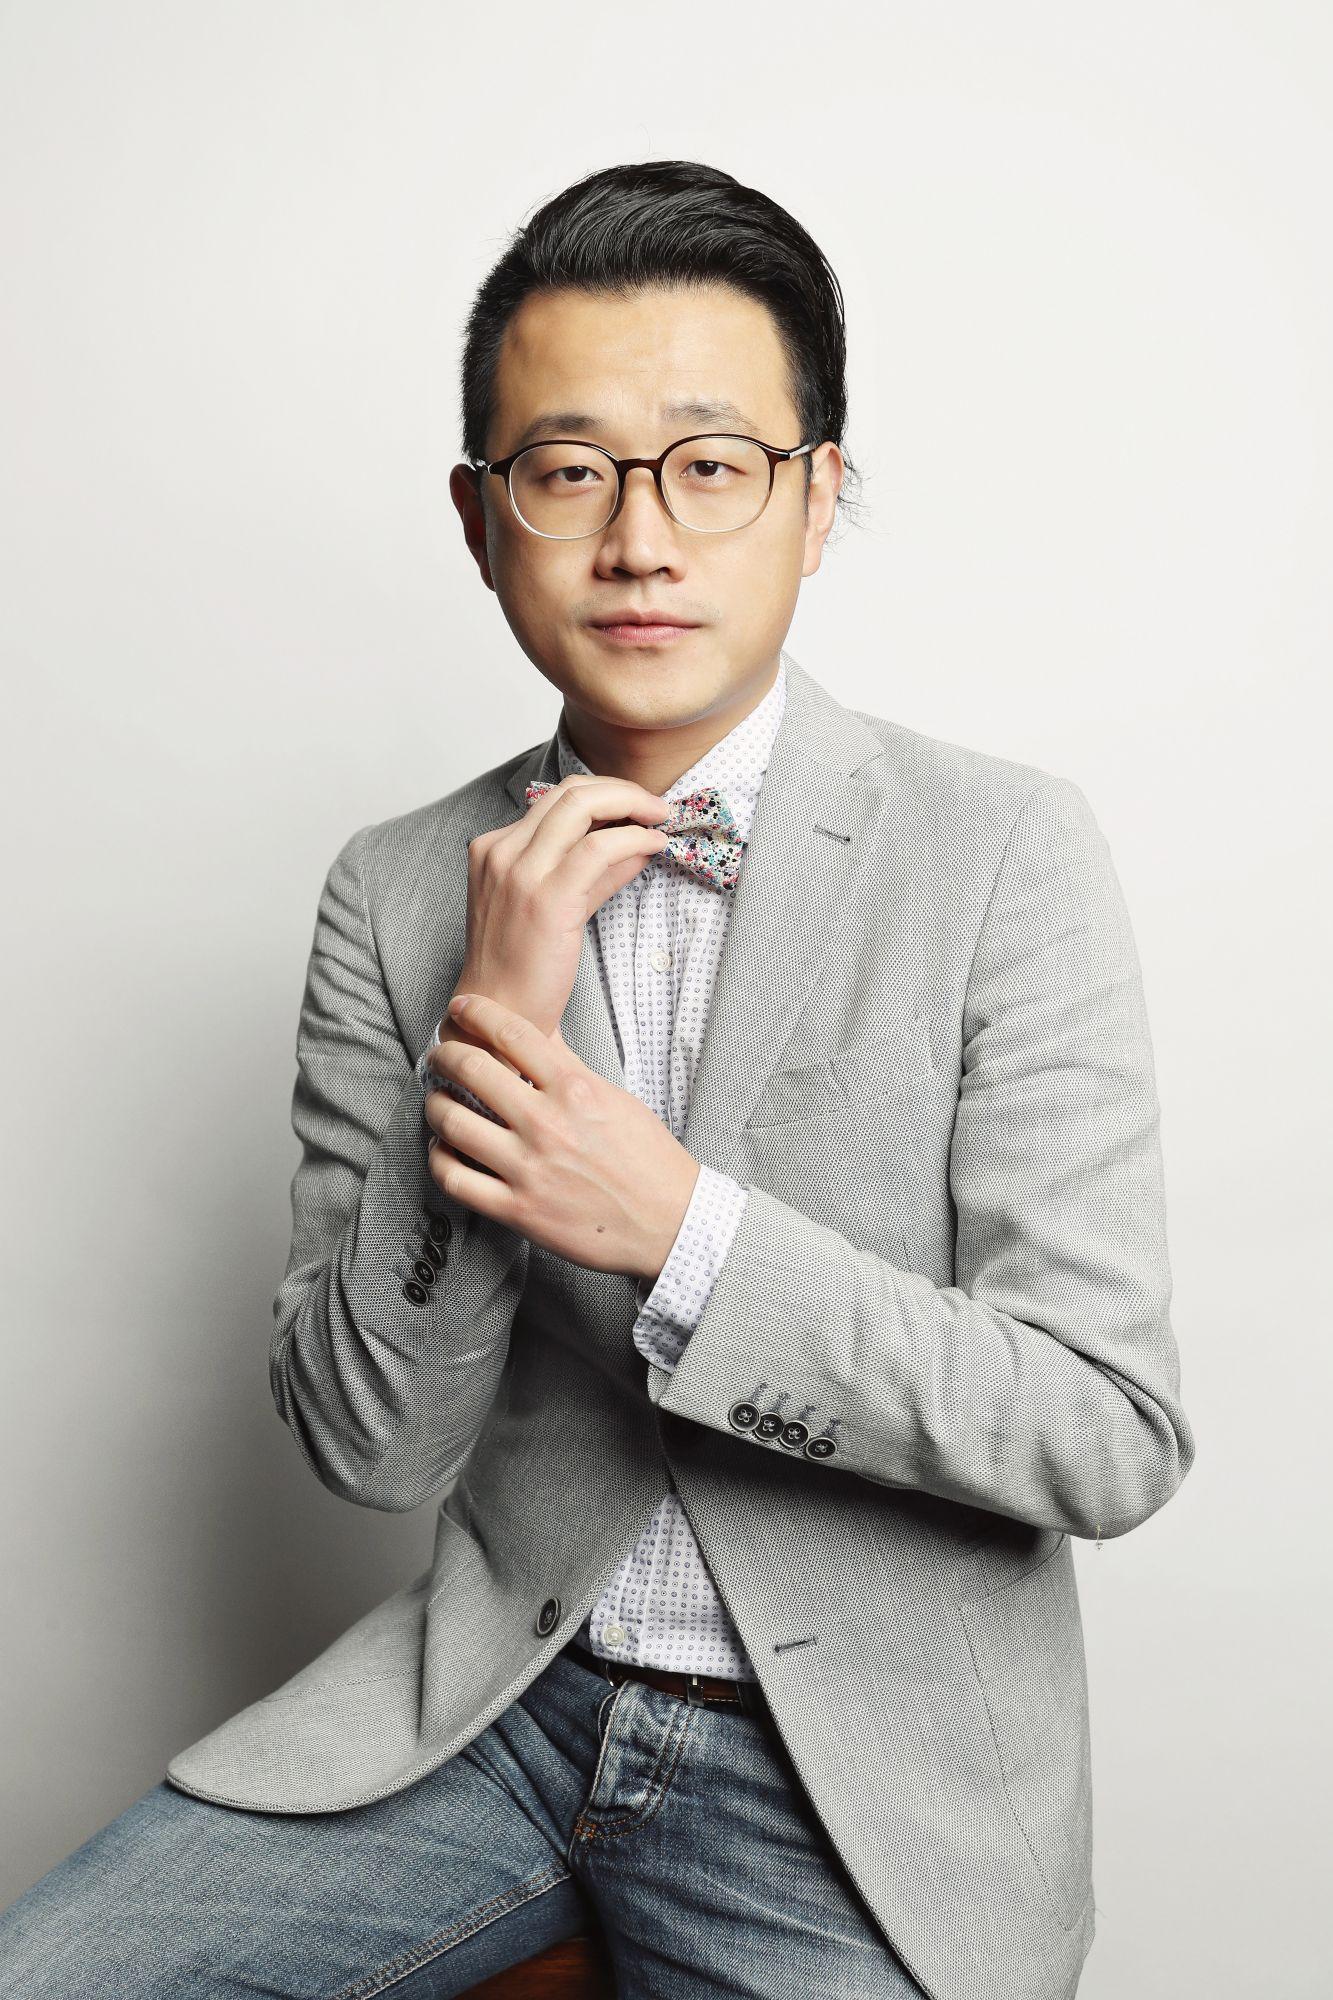 Ian Dai